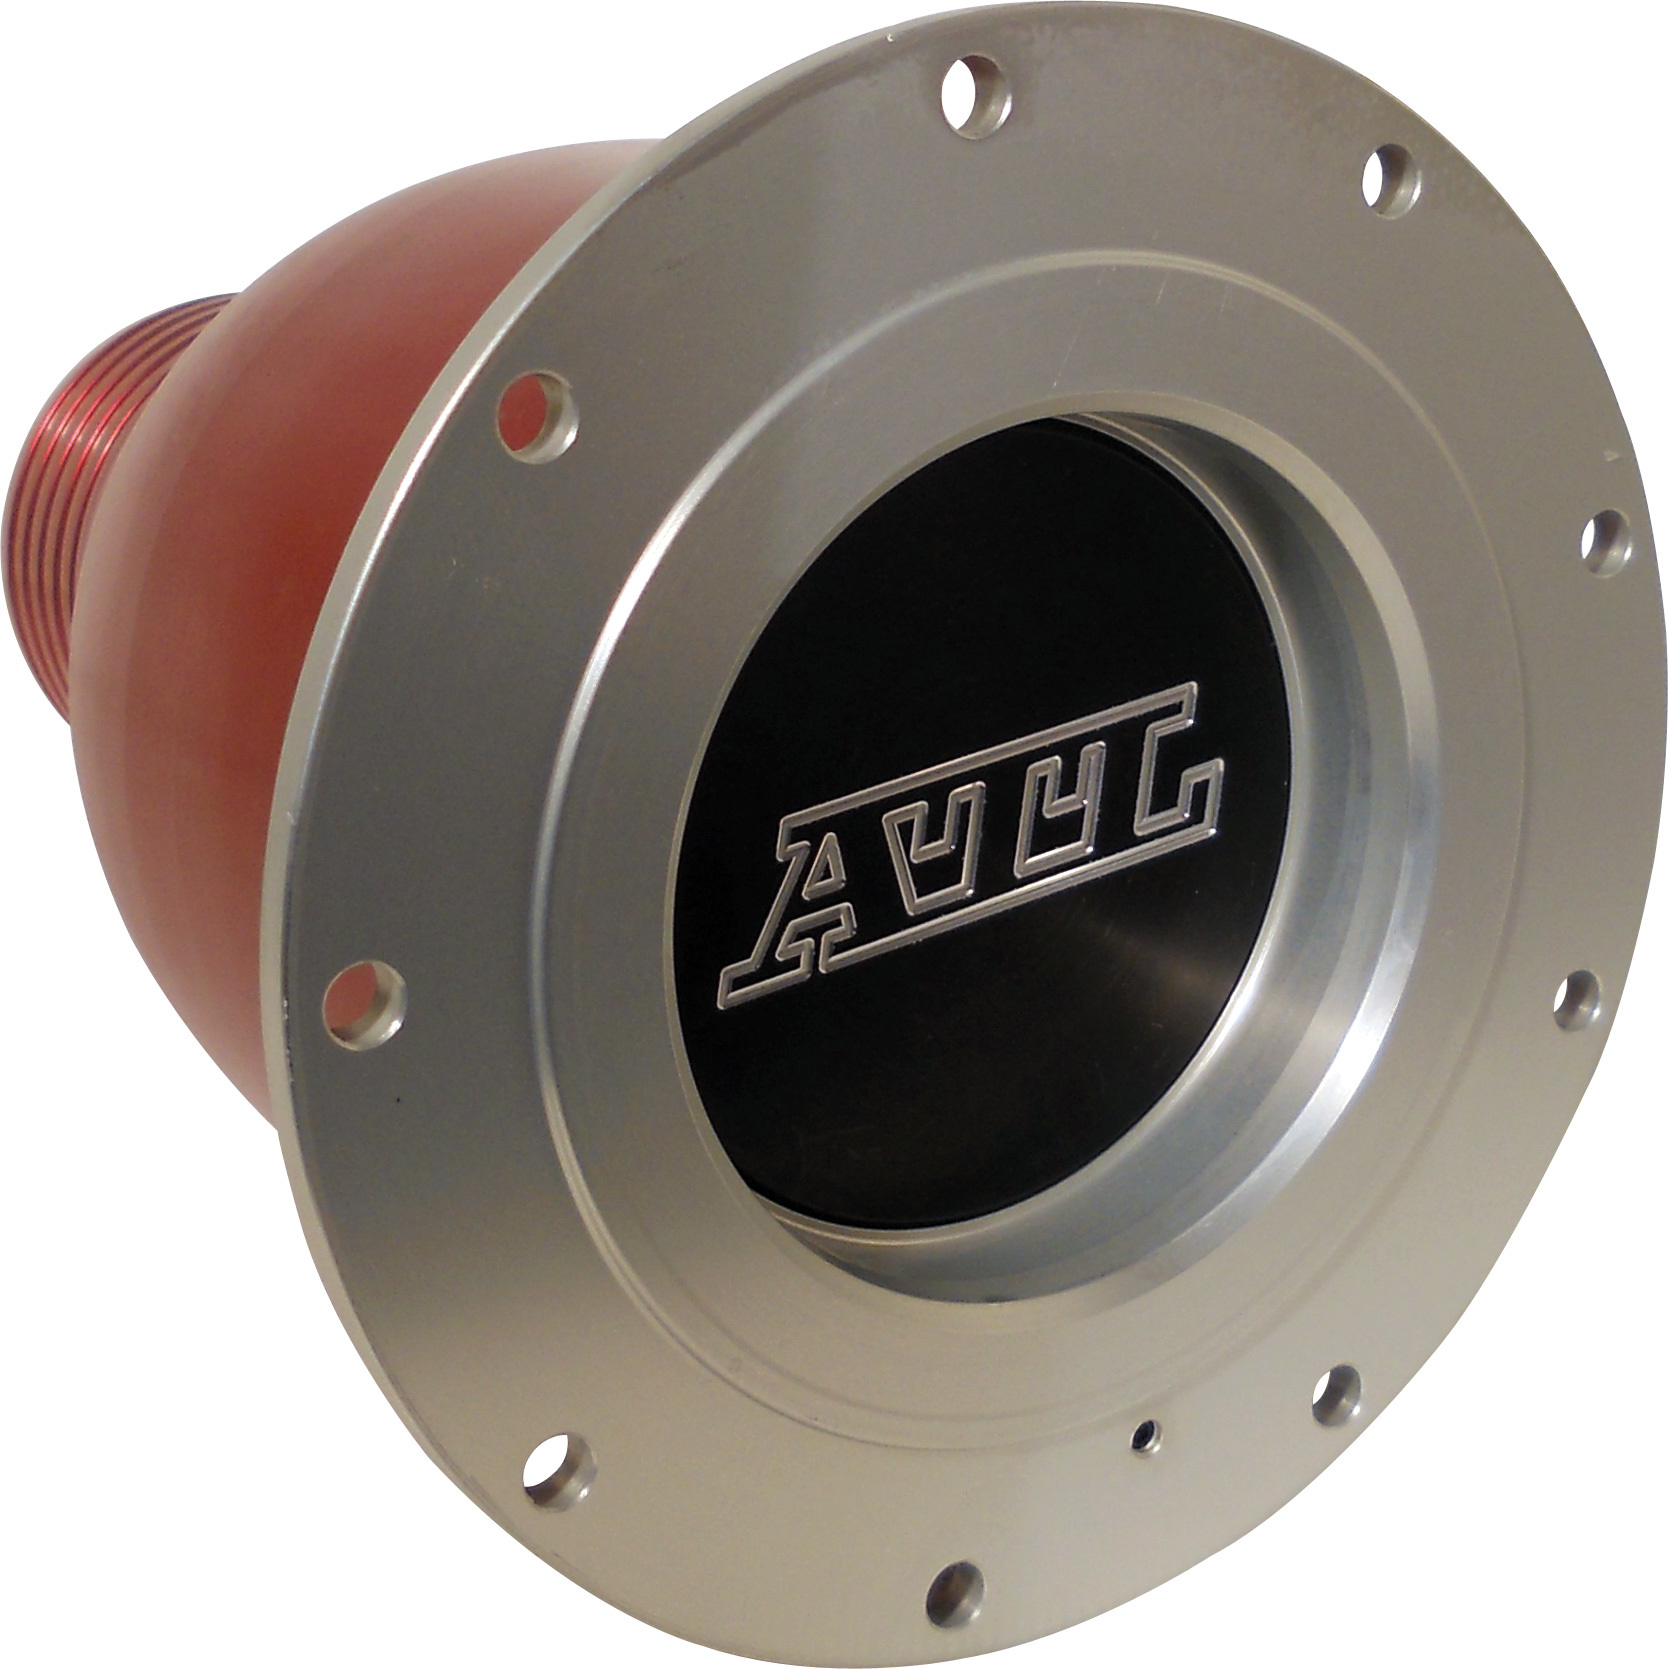 Atl Fuel Cells Dry Break  2-1/4in Femal e  w/ Alum. Bulb